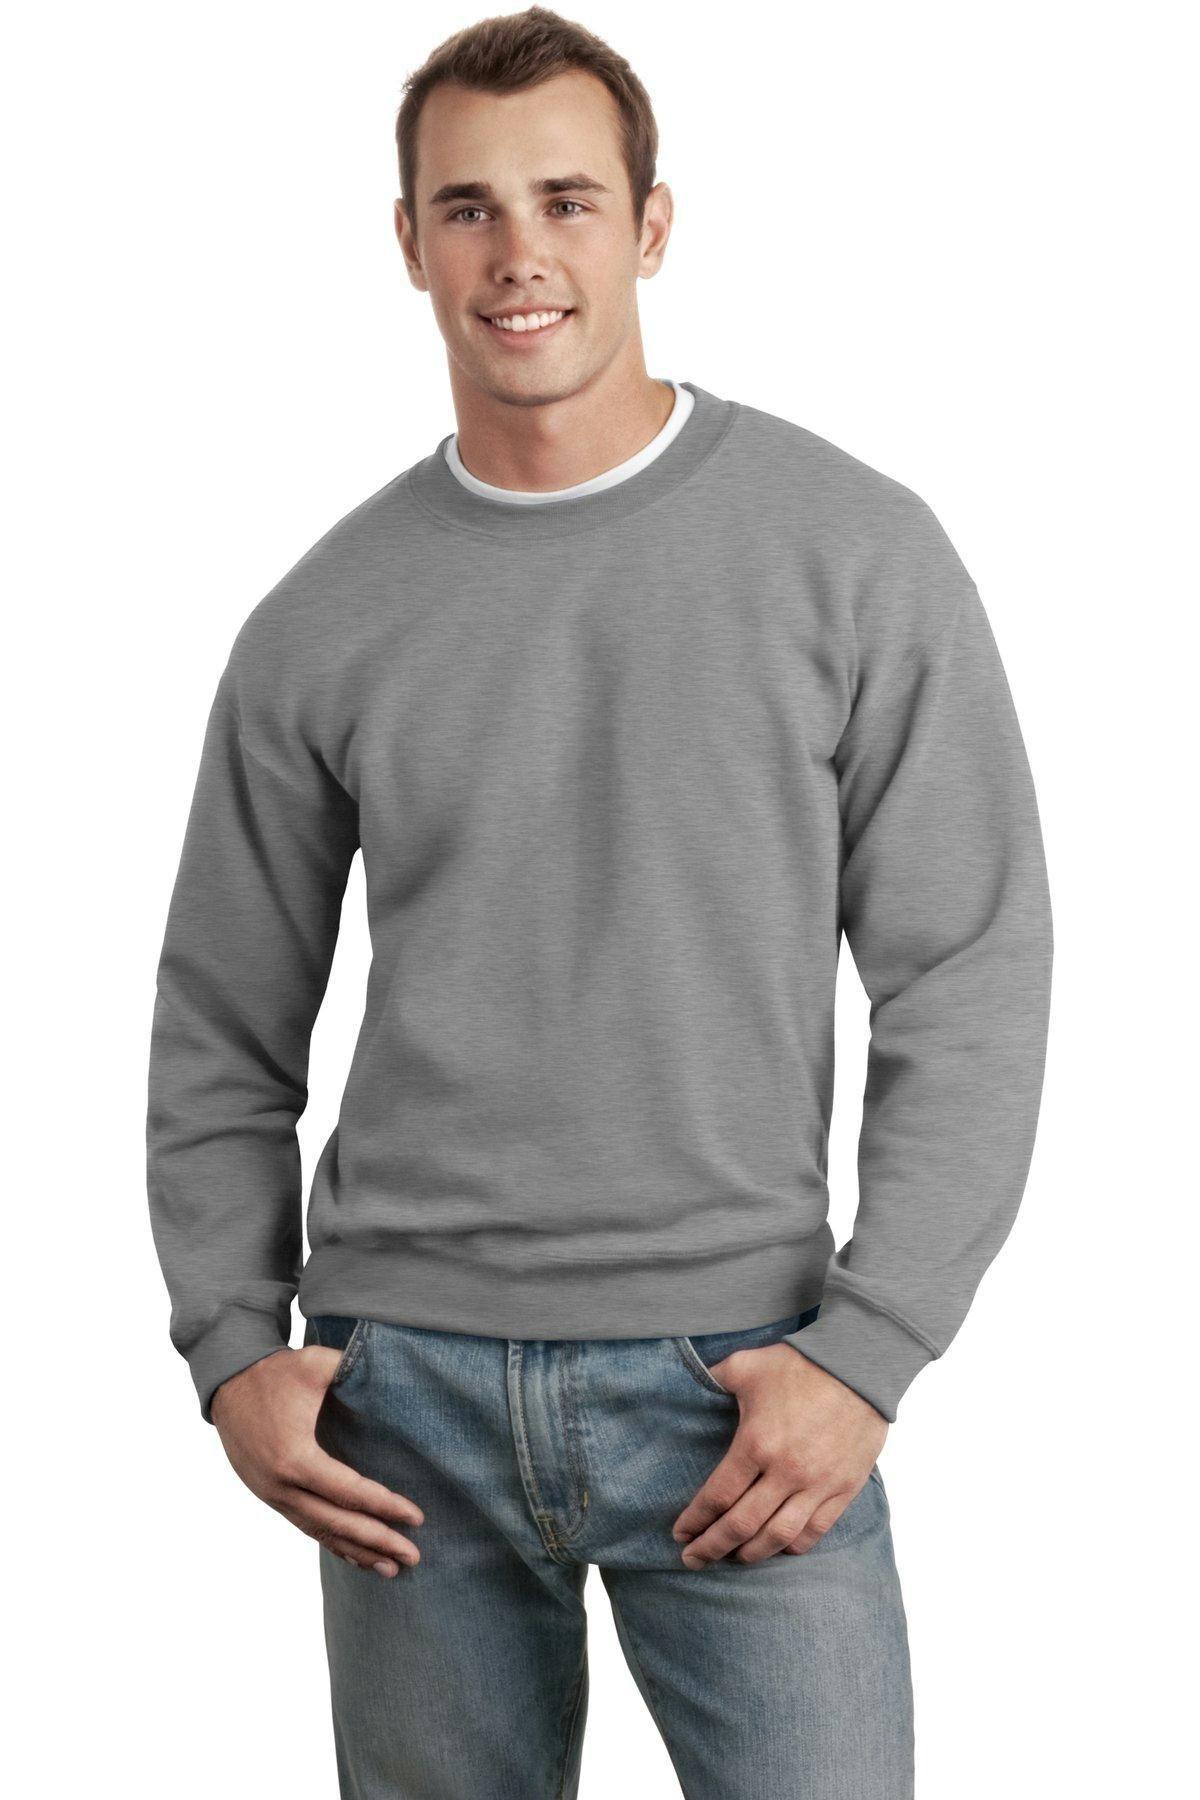 NEW Womens Fleece Sweatshirt Small Solid Blue Crew Neck Pullover Sweats Gildan